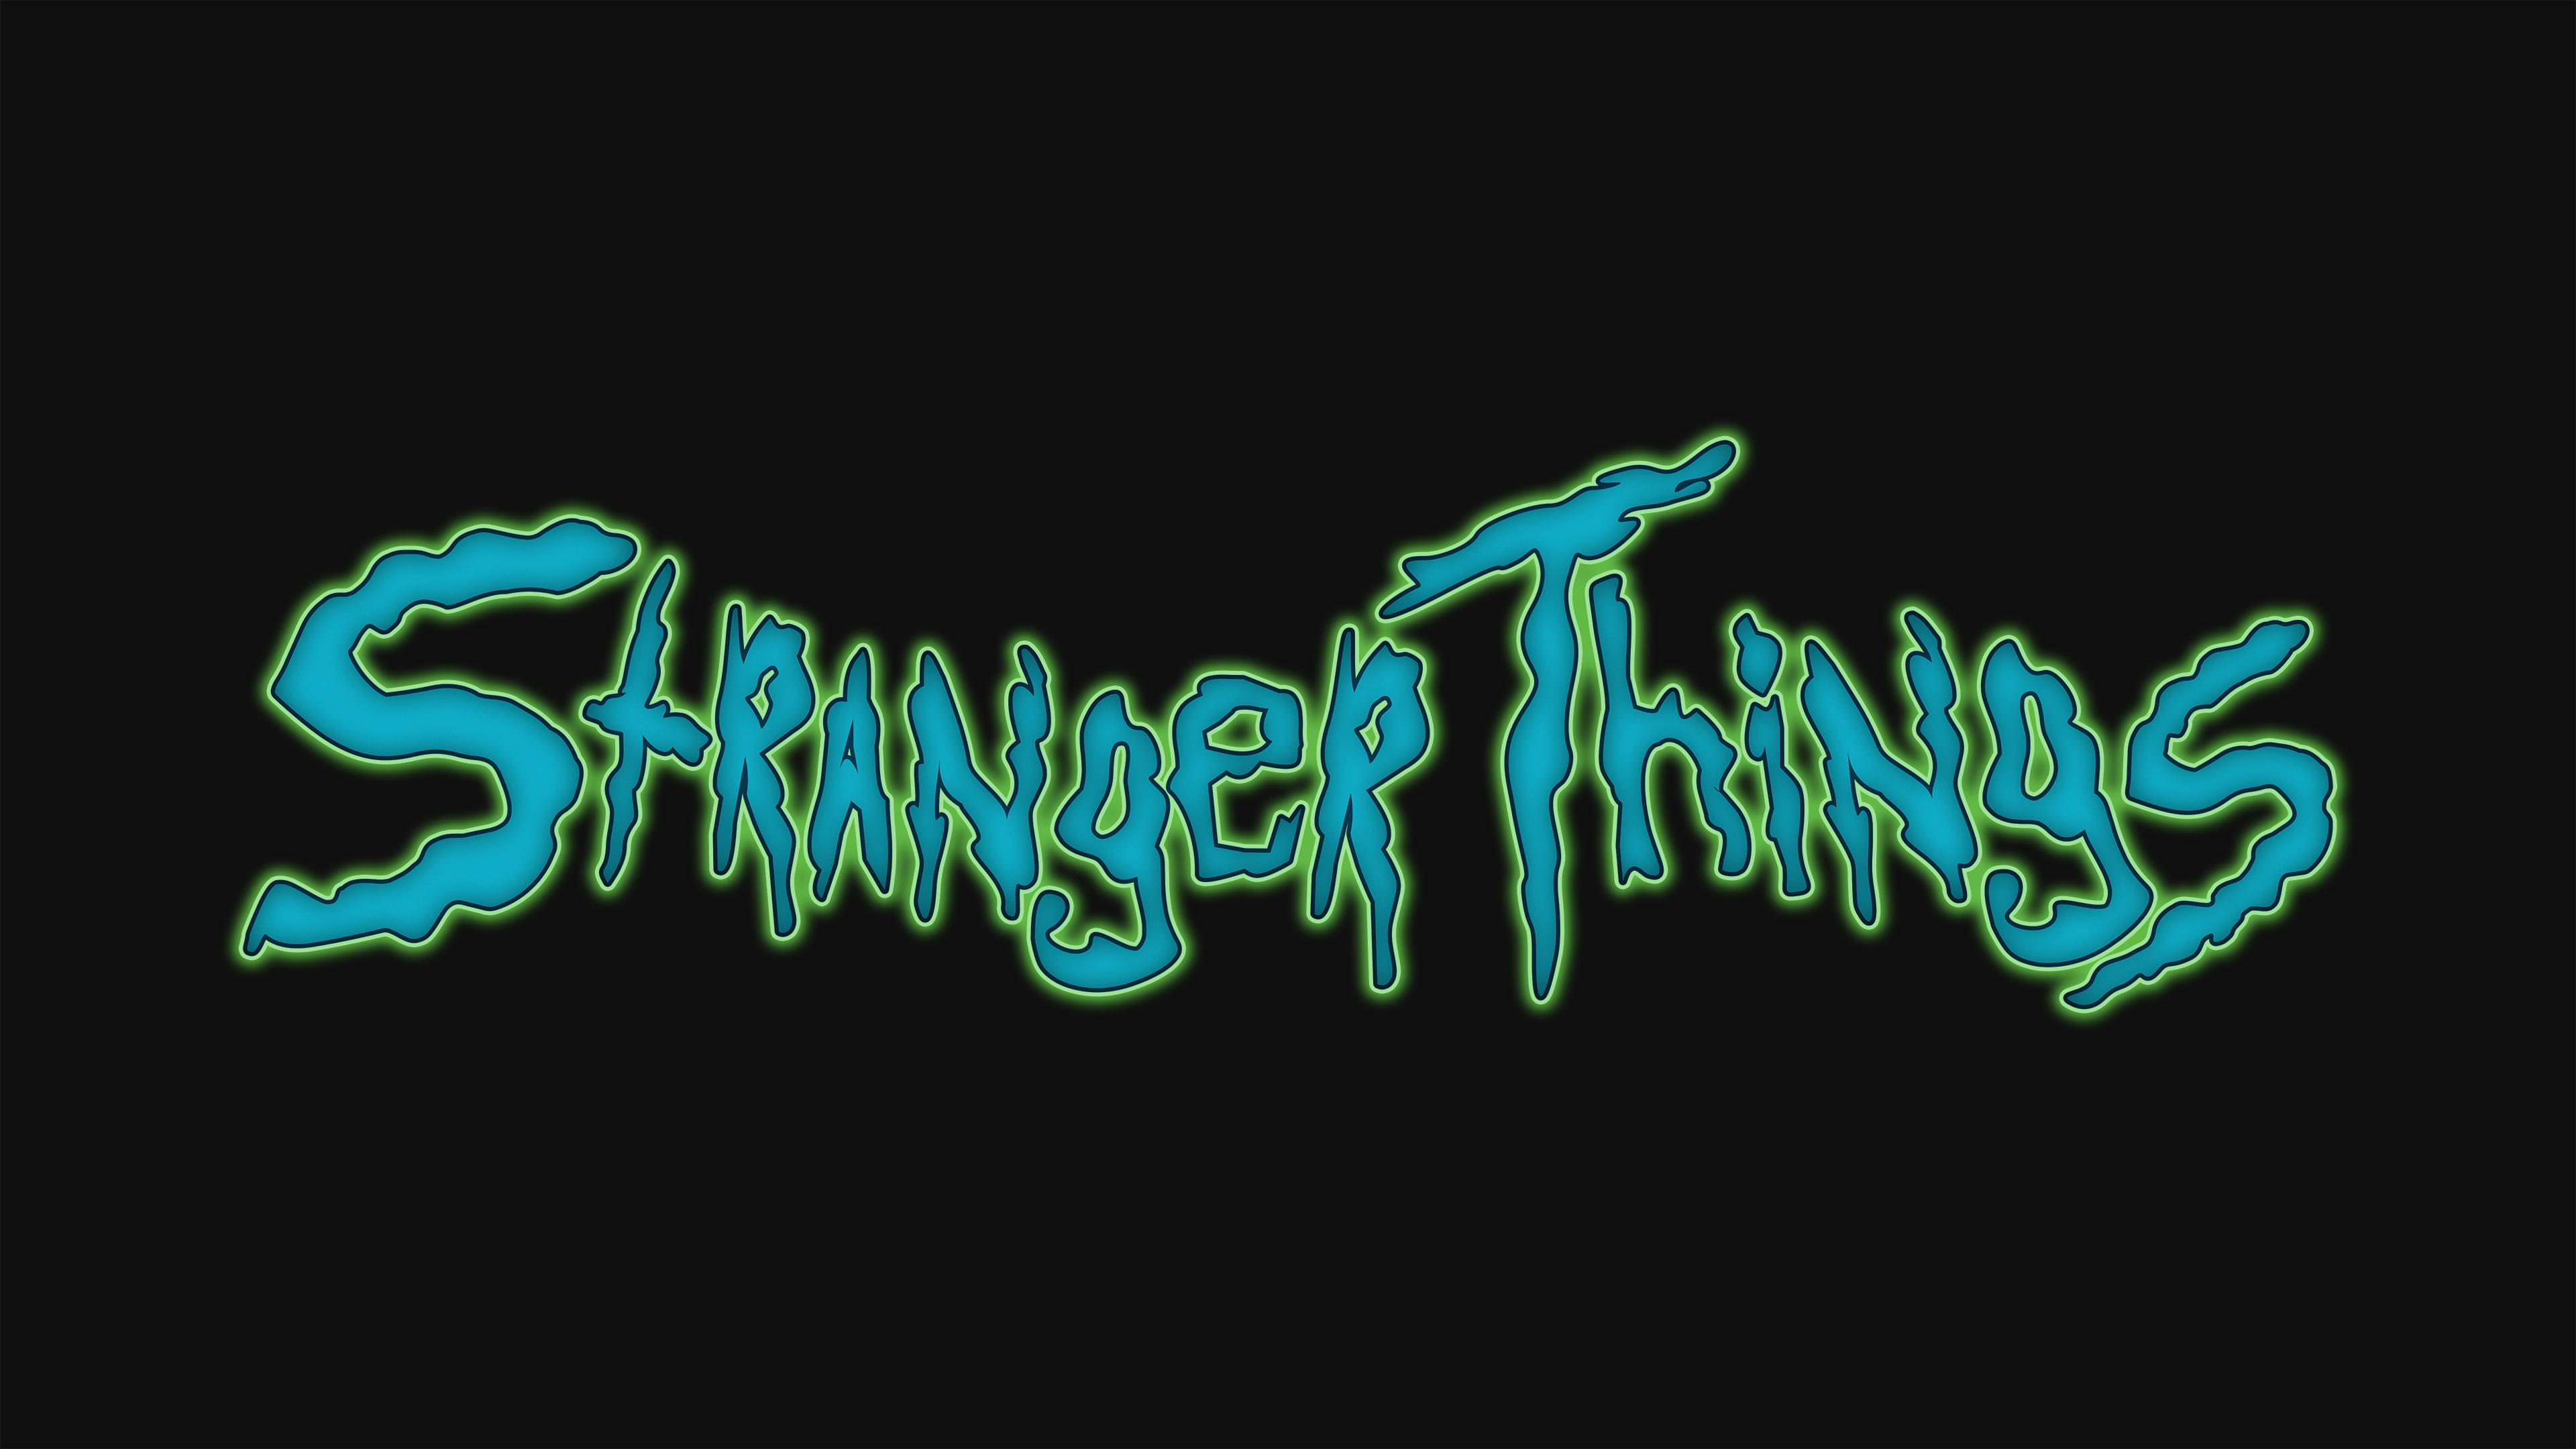 Stranger Things Creative Logo 4k Hd Tv Shows 4k Wallpapers